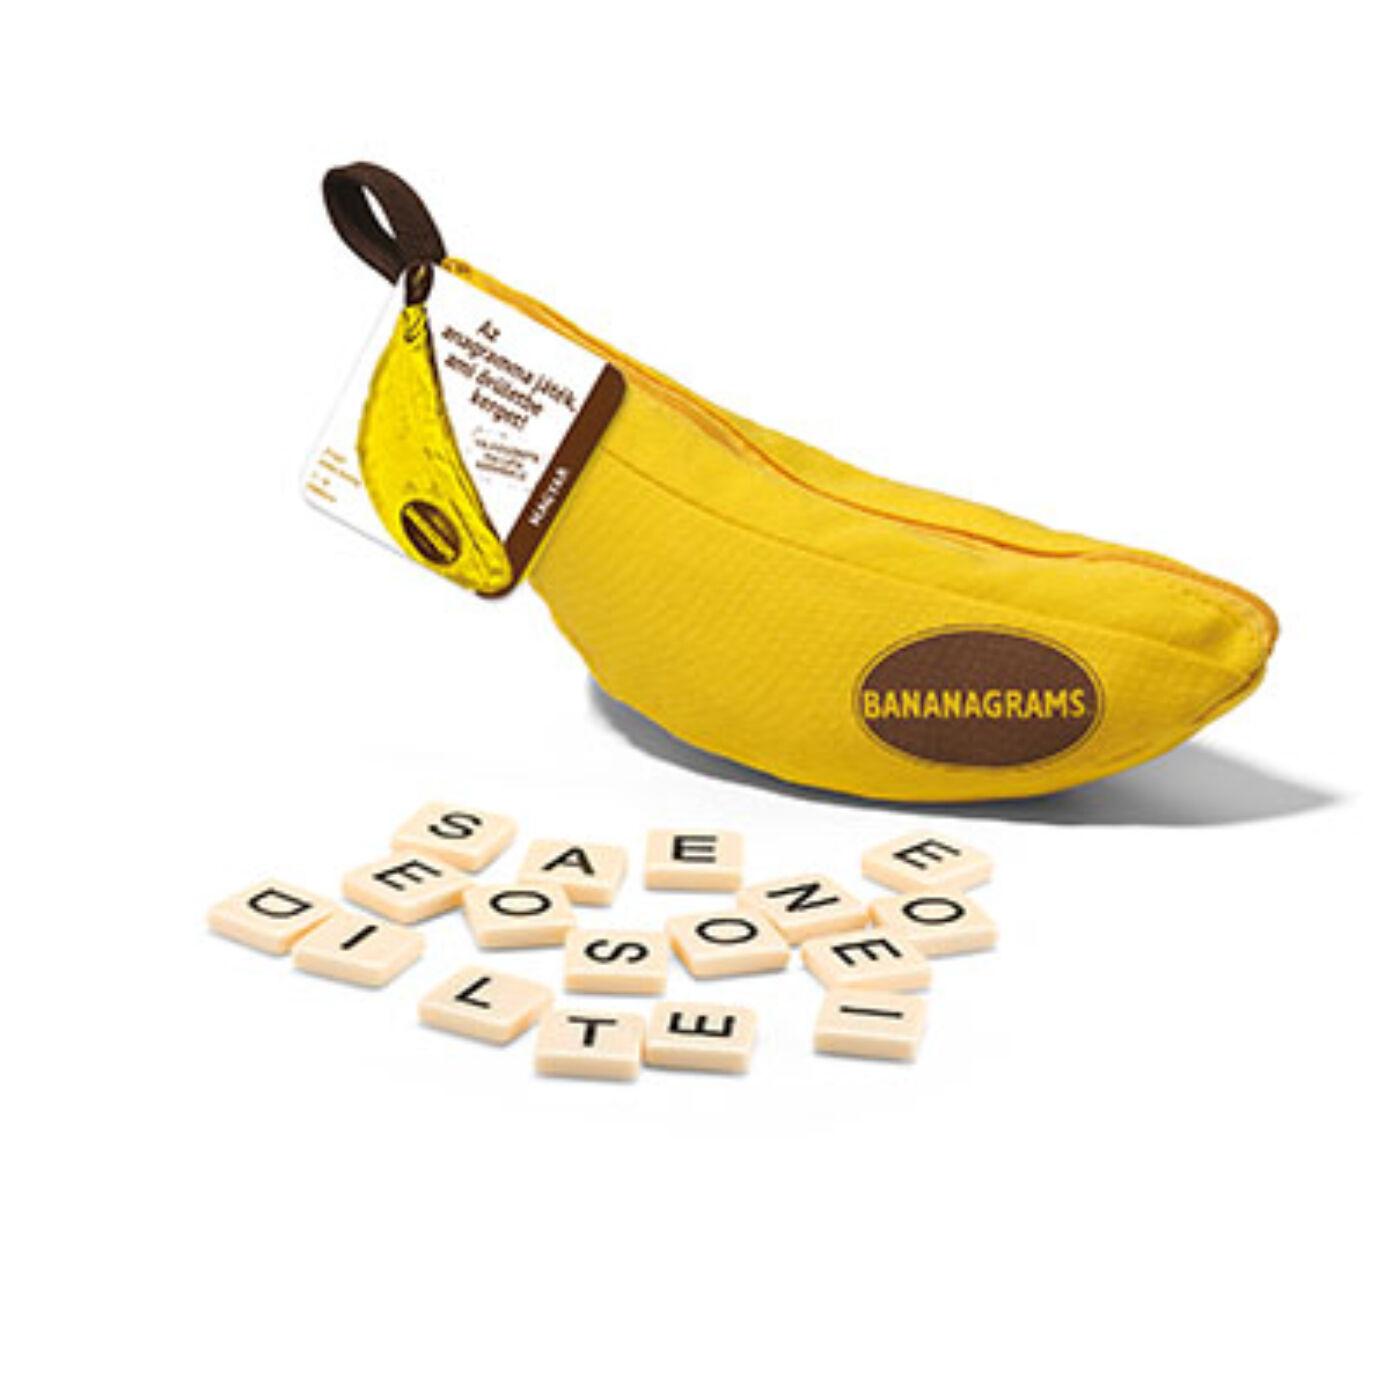 Bananagramas